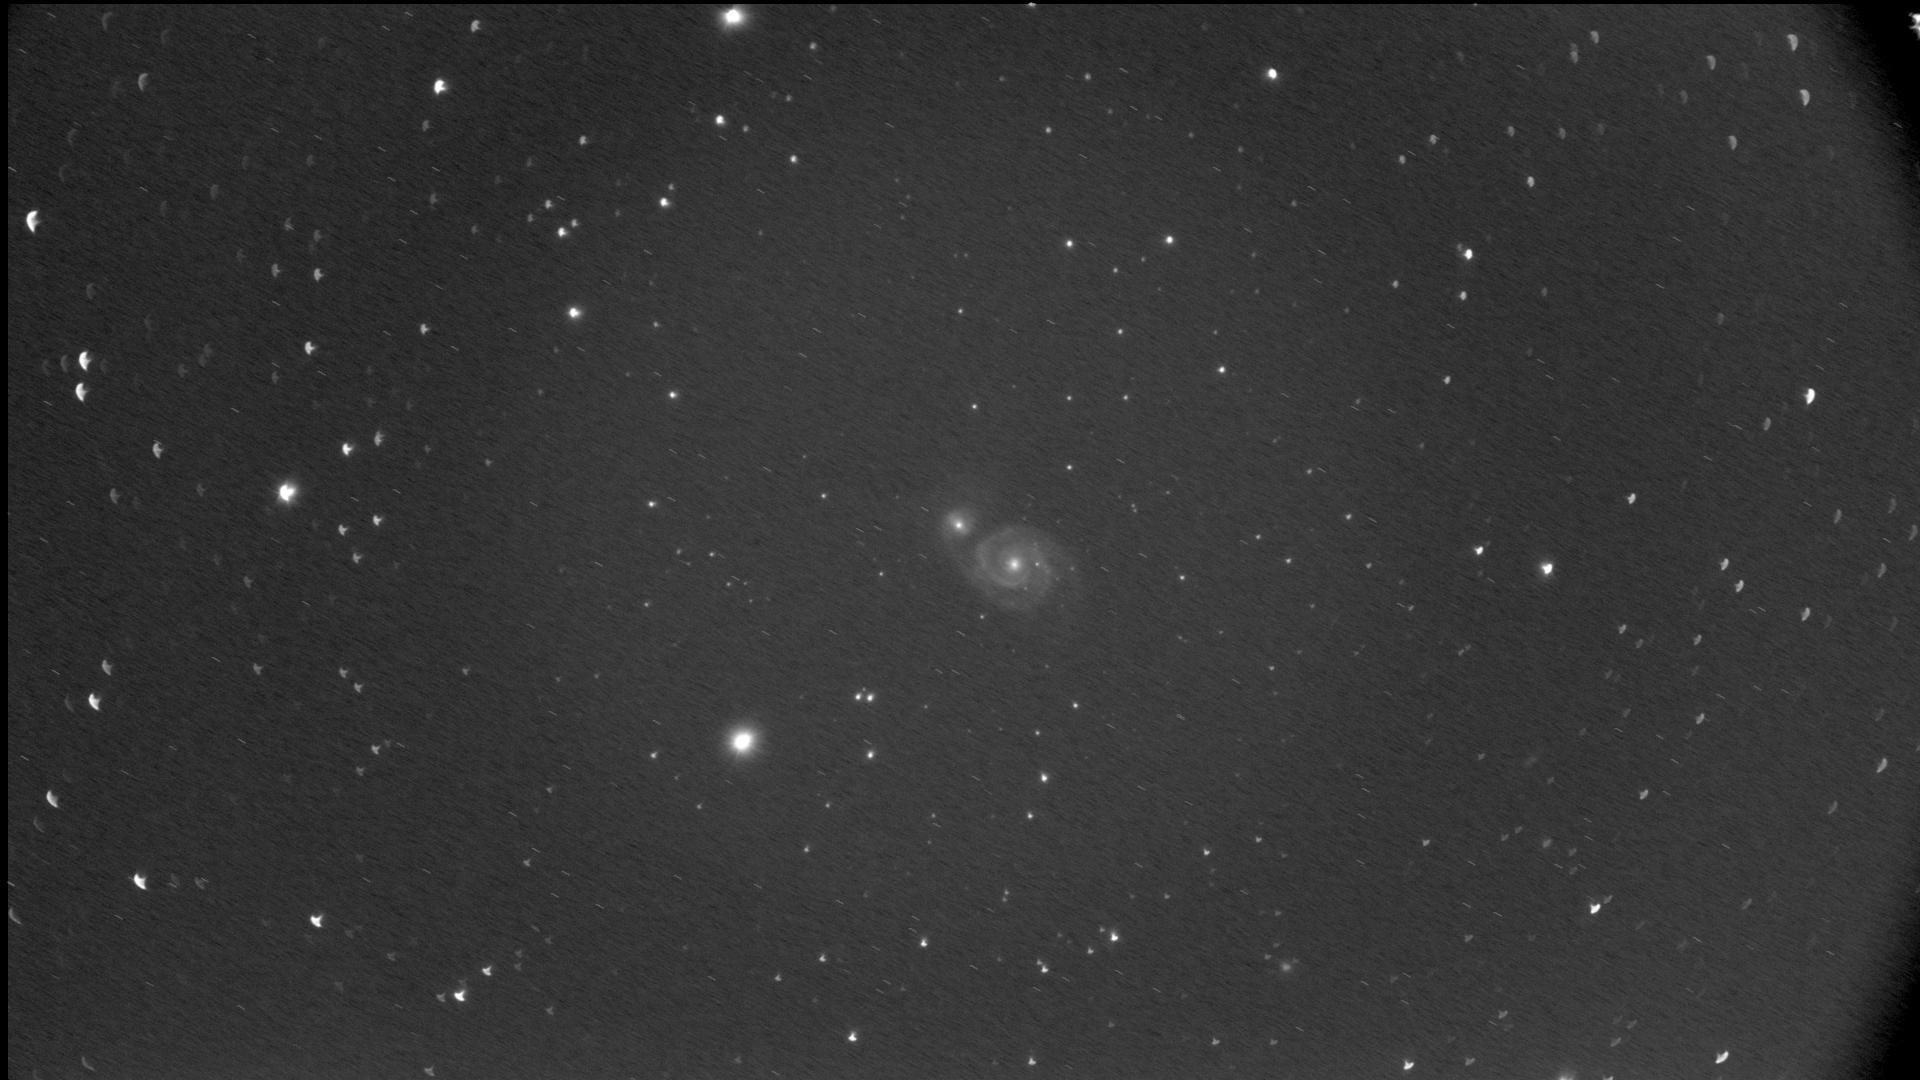 M51.jpg.22cd072097b514531d817127c9ba1fe8.jpg